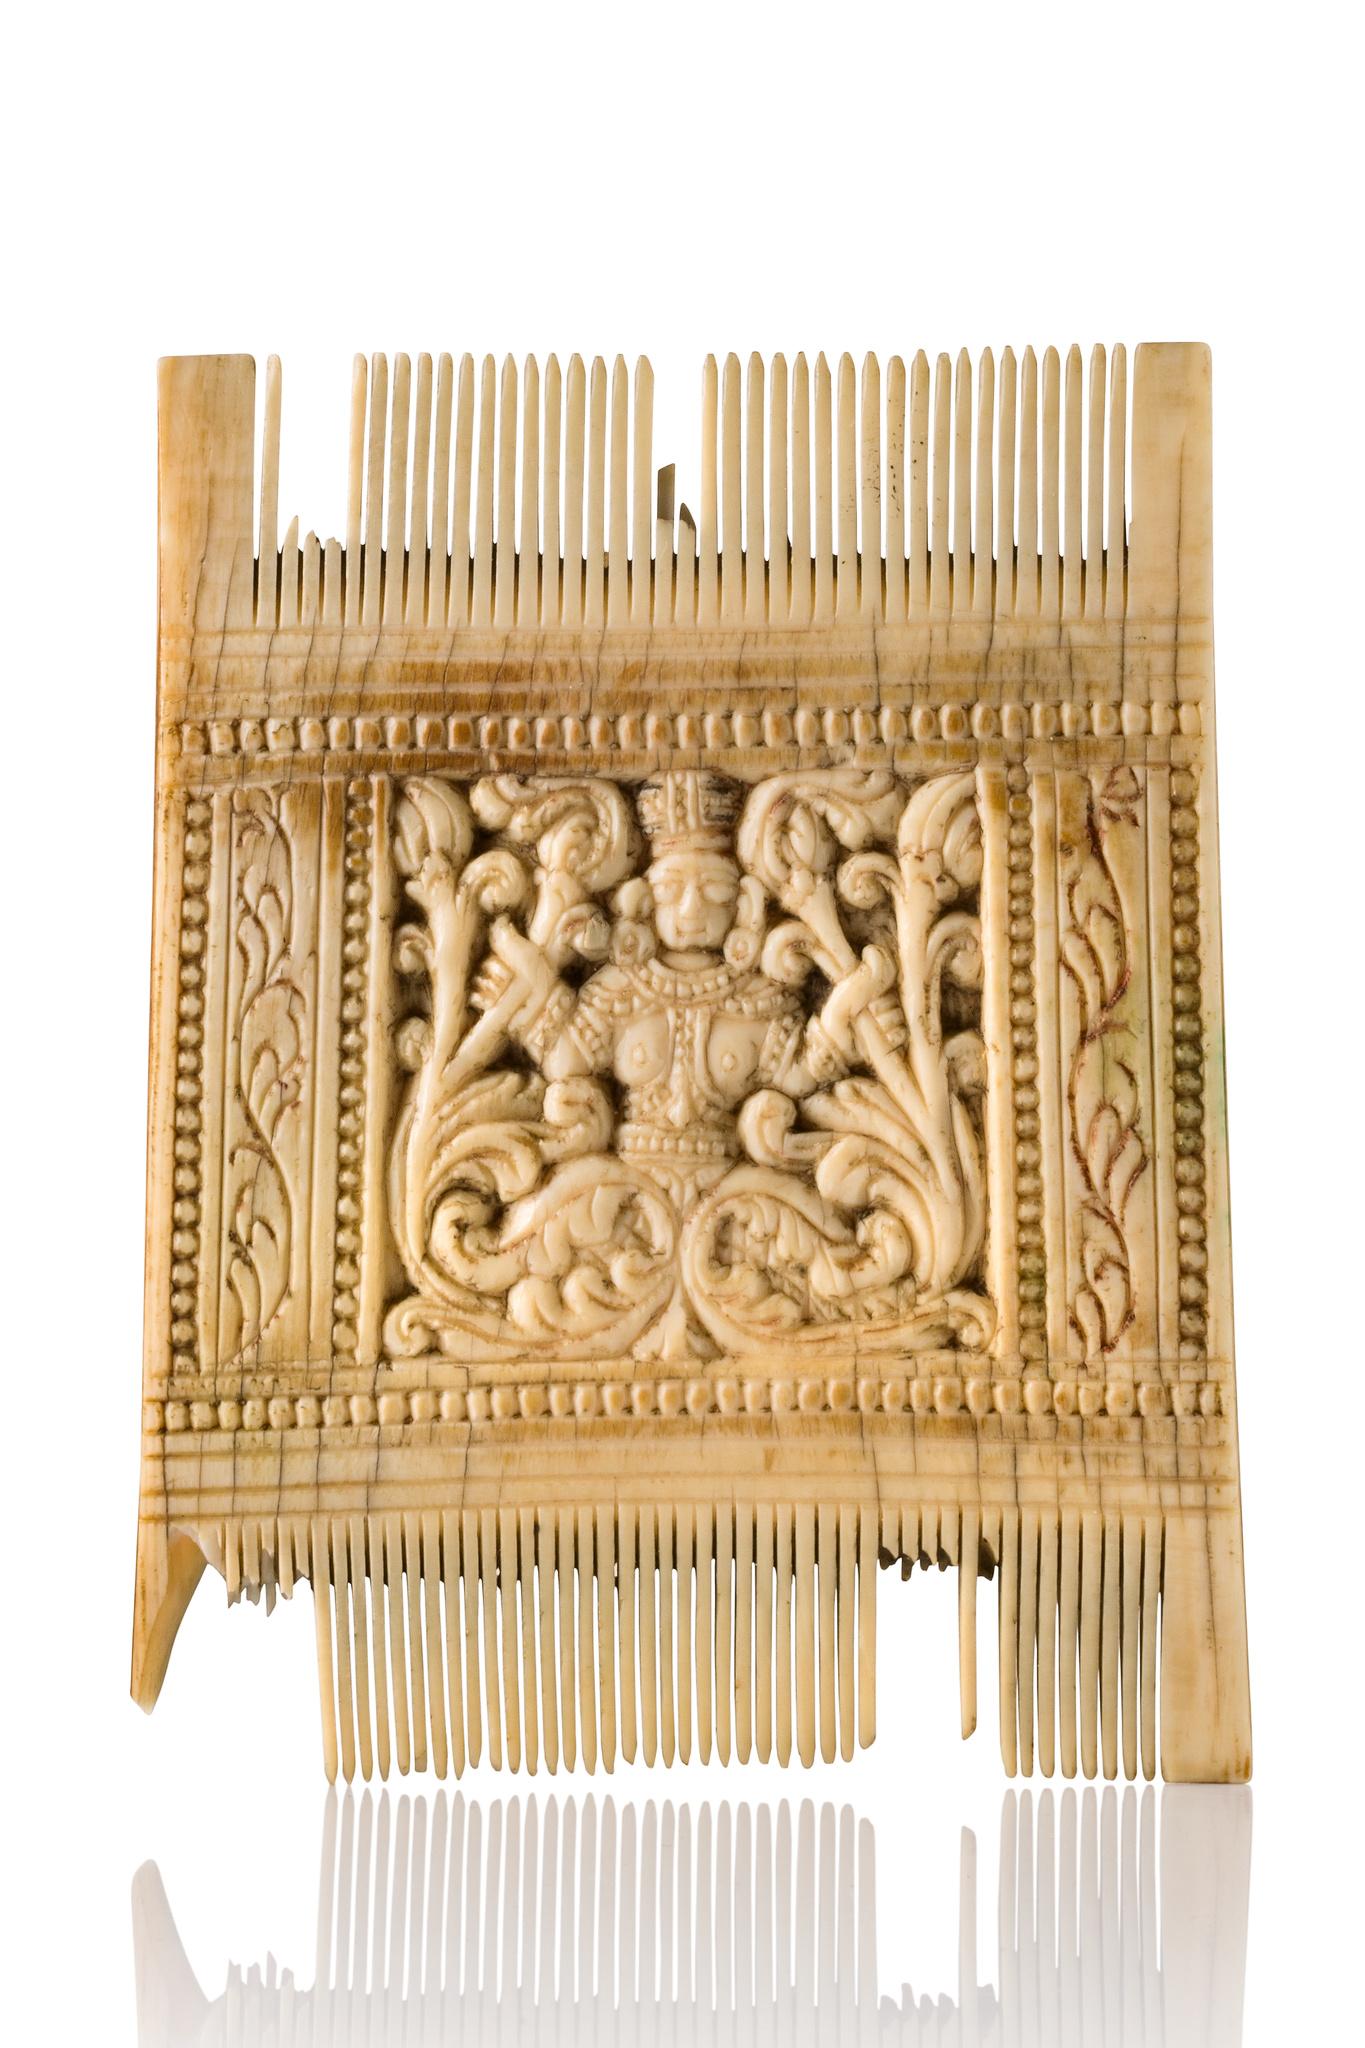 Rare ivory ornamental comb